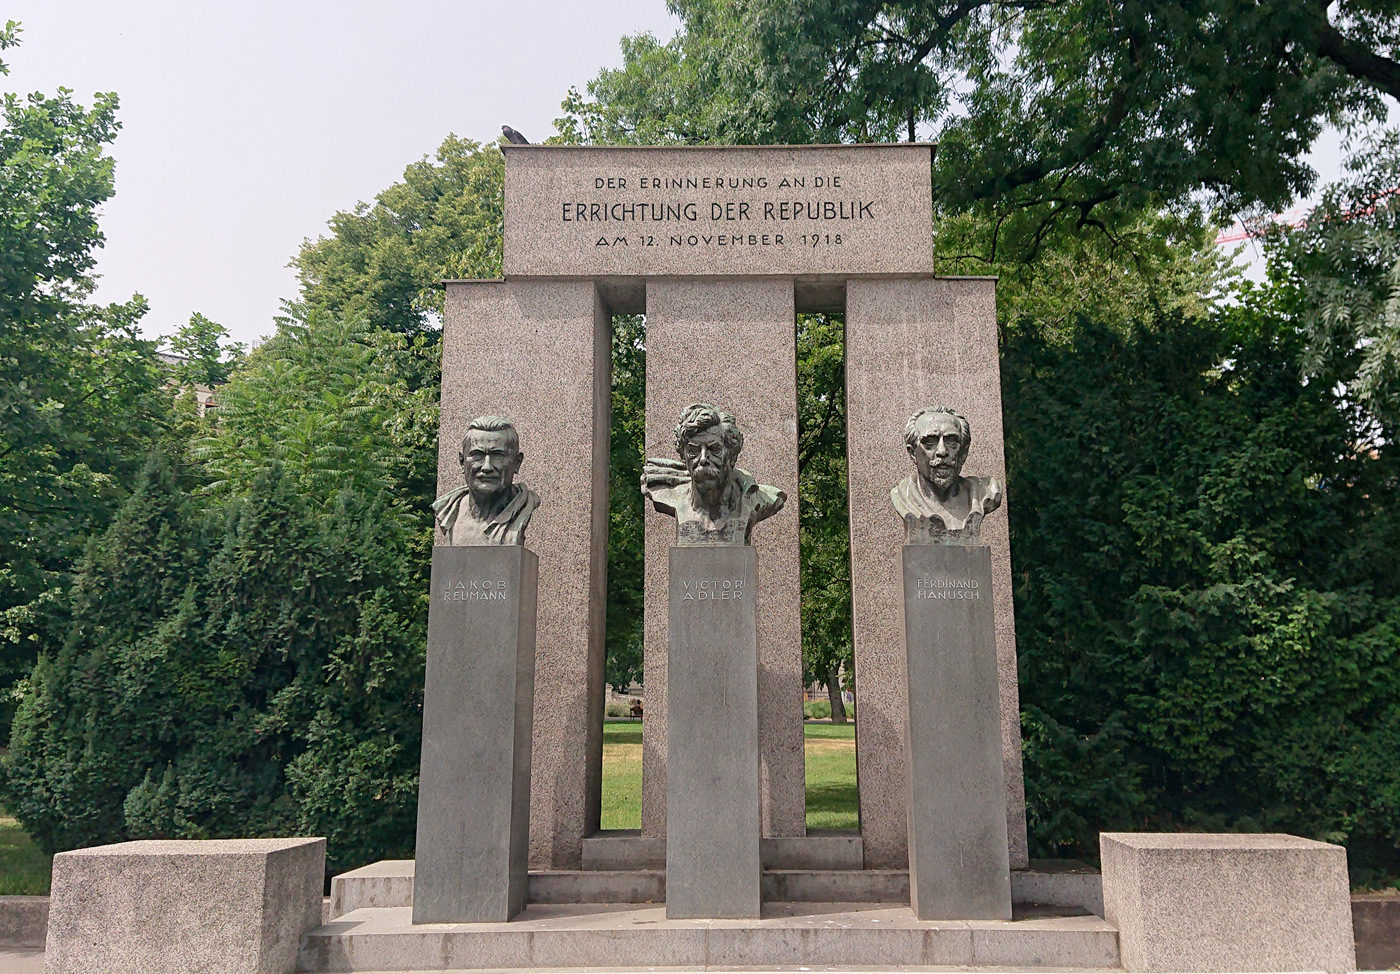 Justizpalast Wien - Das Denkmal der Republick gleich in der Nähe - www.wien-erleben.com